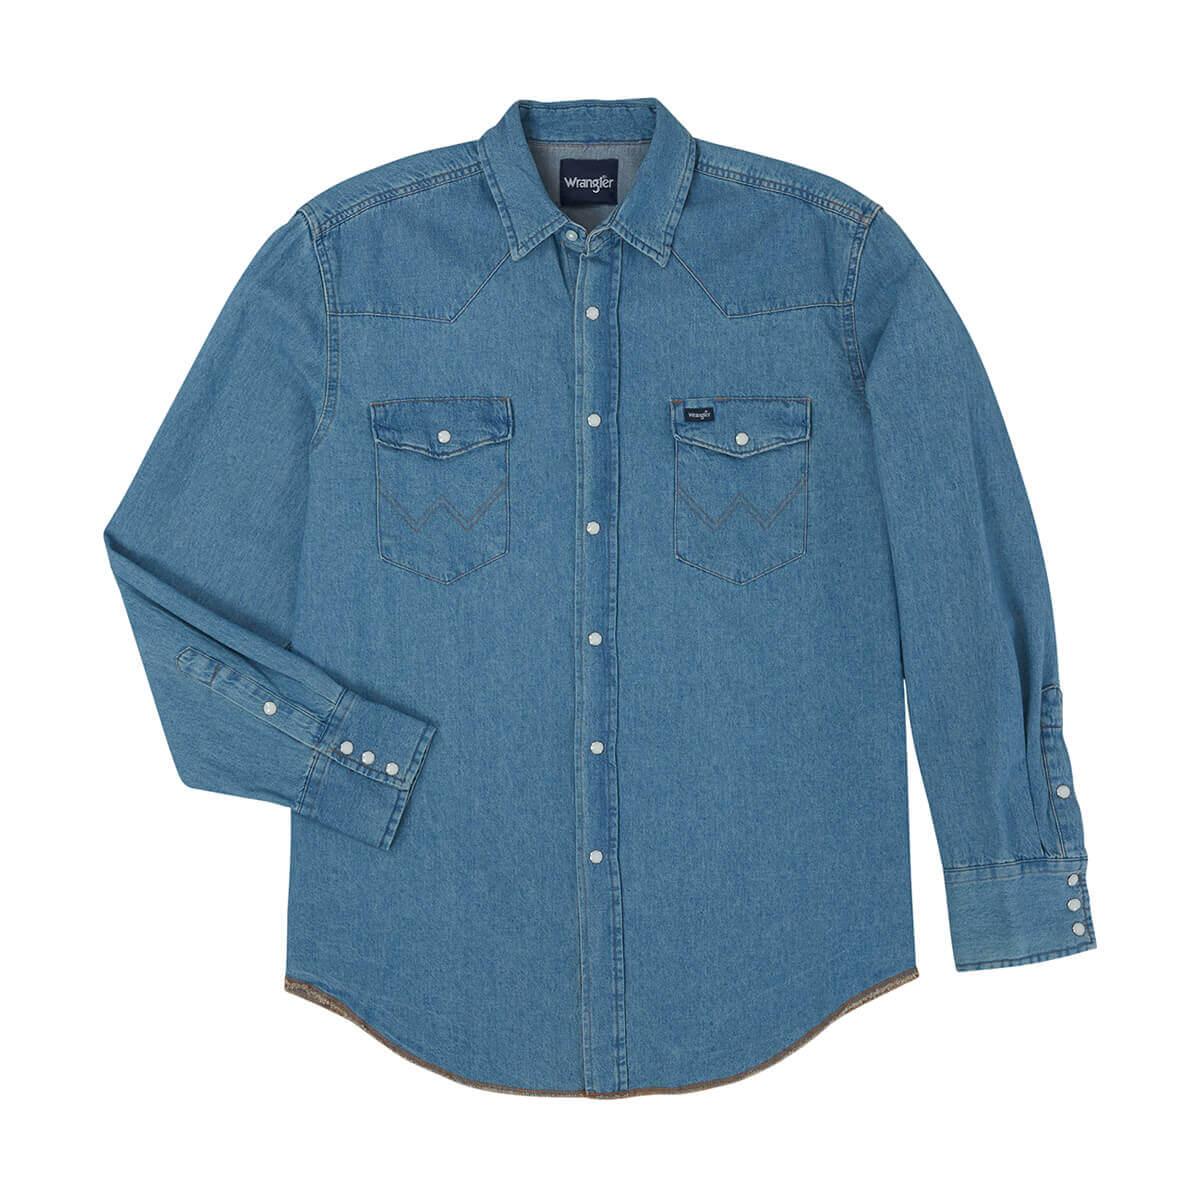 Wrangler - Men's Stonewash Denim Work Shirt - M